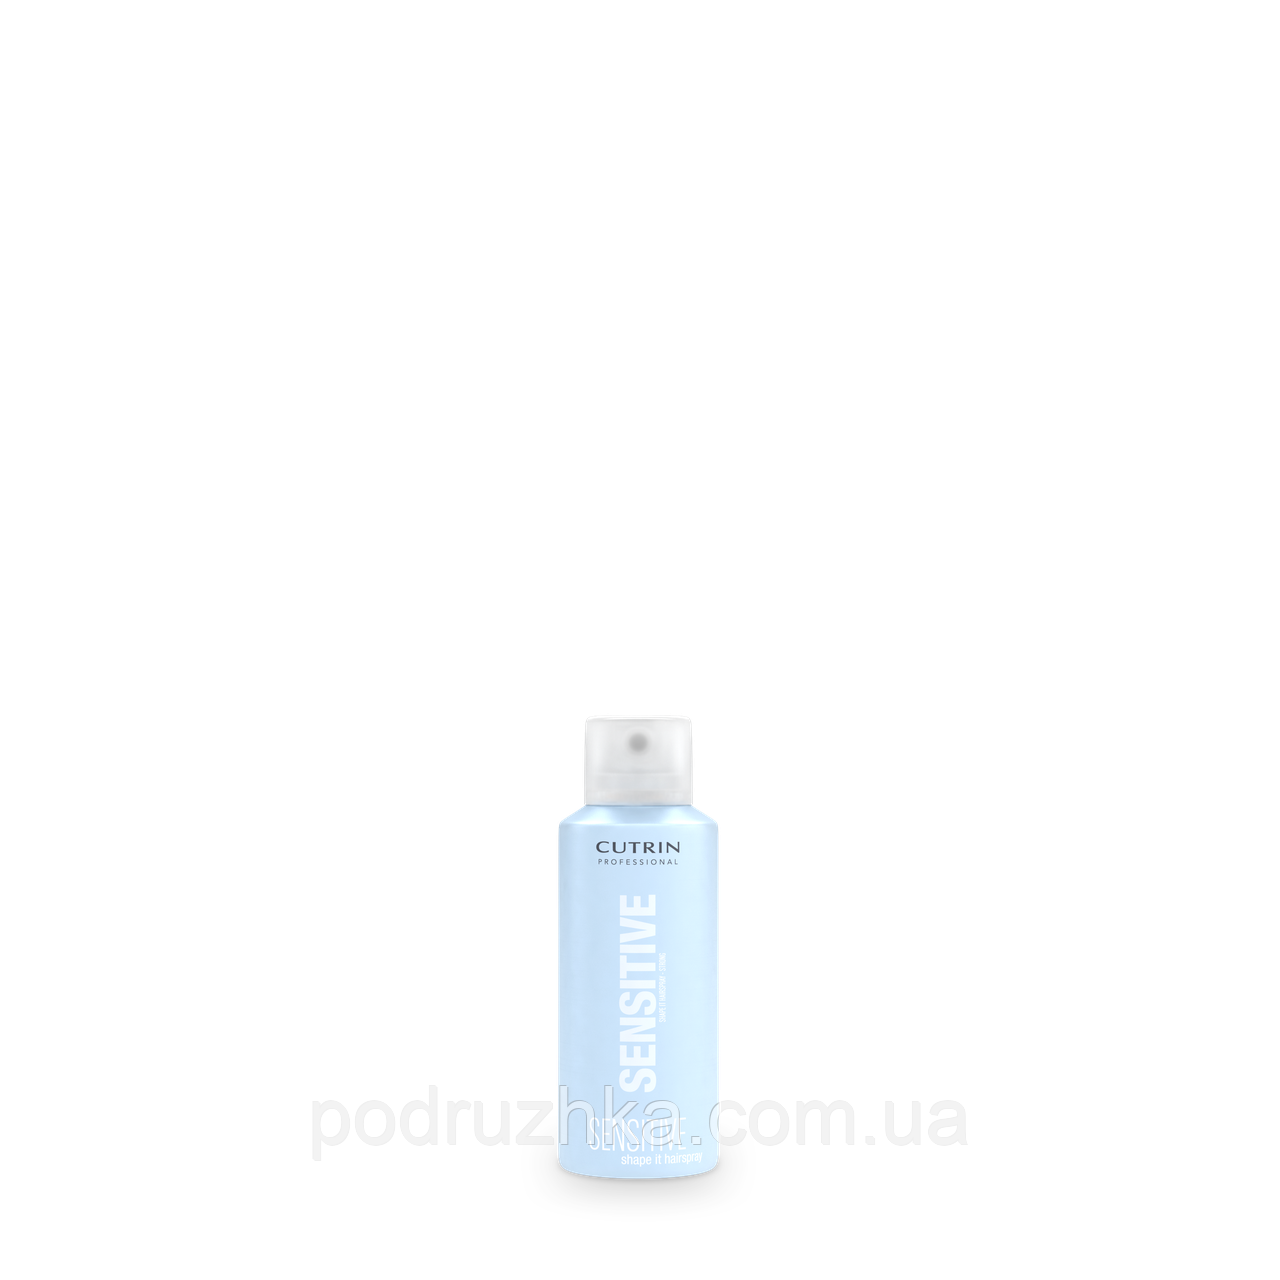 Cutrin Sensitive Shape It Hair Spray Strong No Fragrances Лак сильной фиксации без отдушки, 100 мл